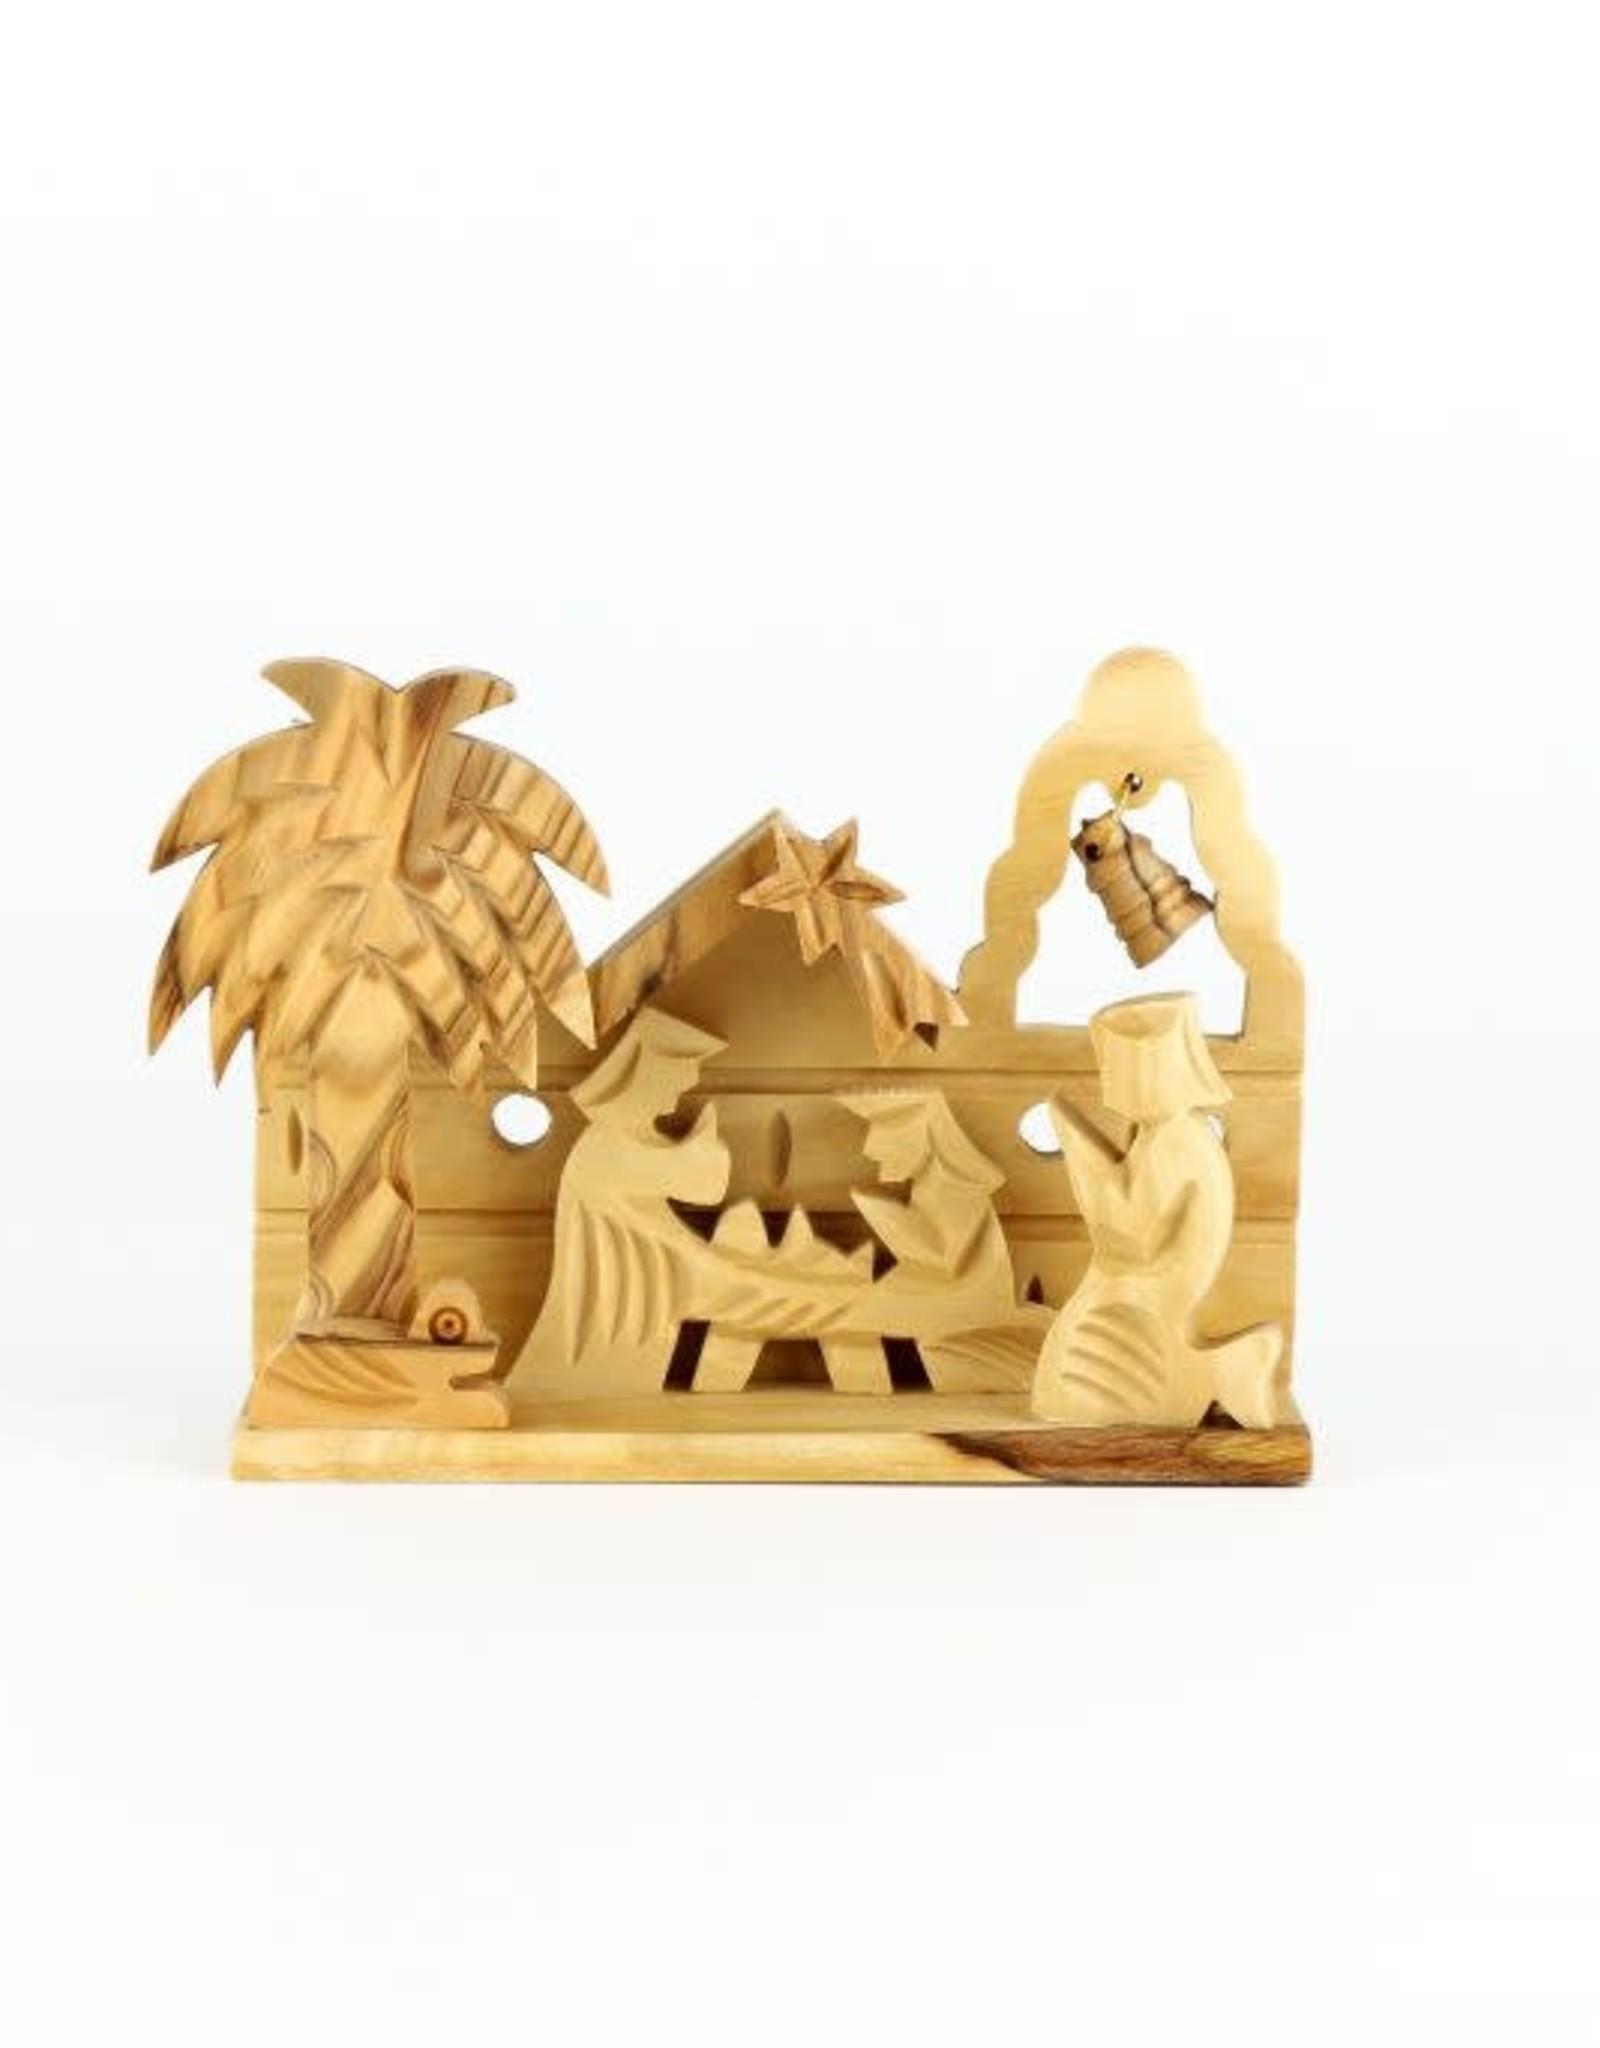 Small Nativity Scene in olive wood